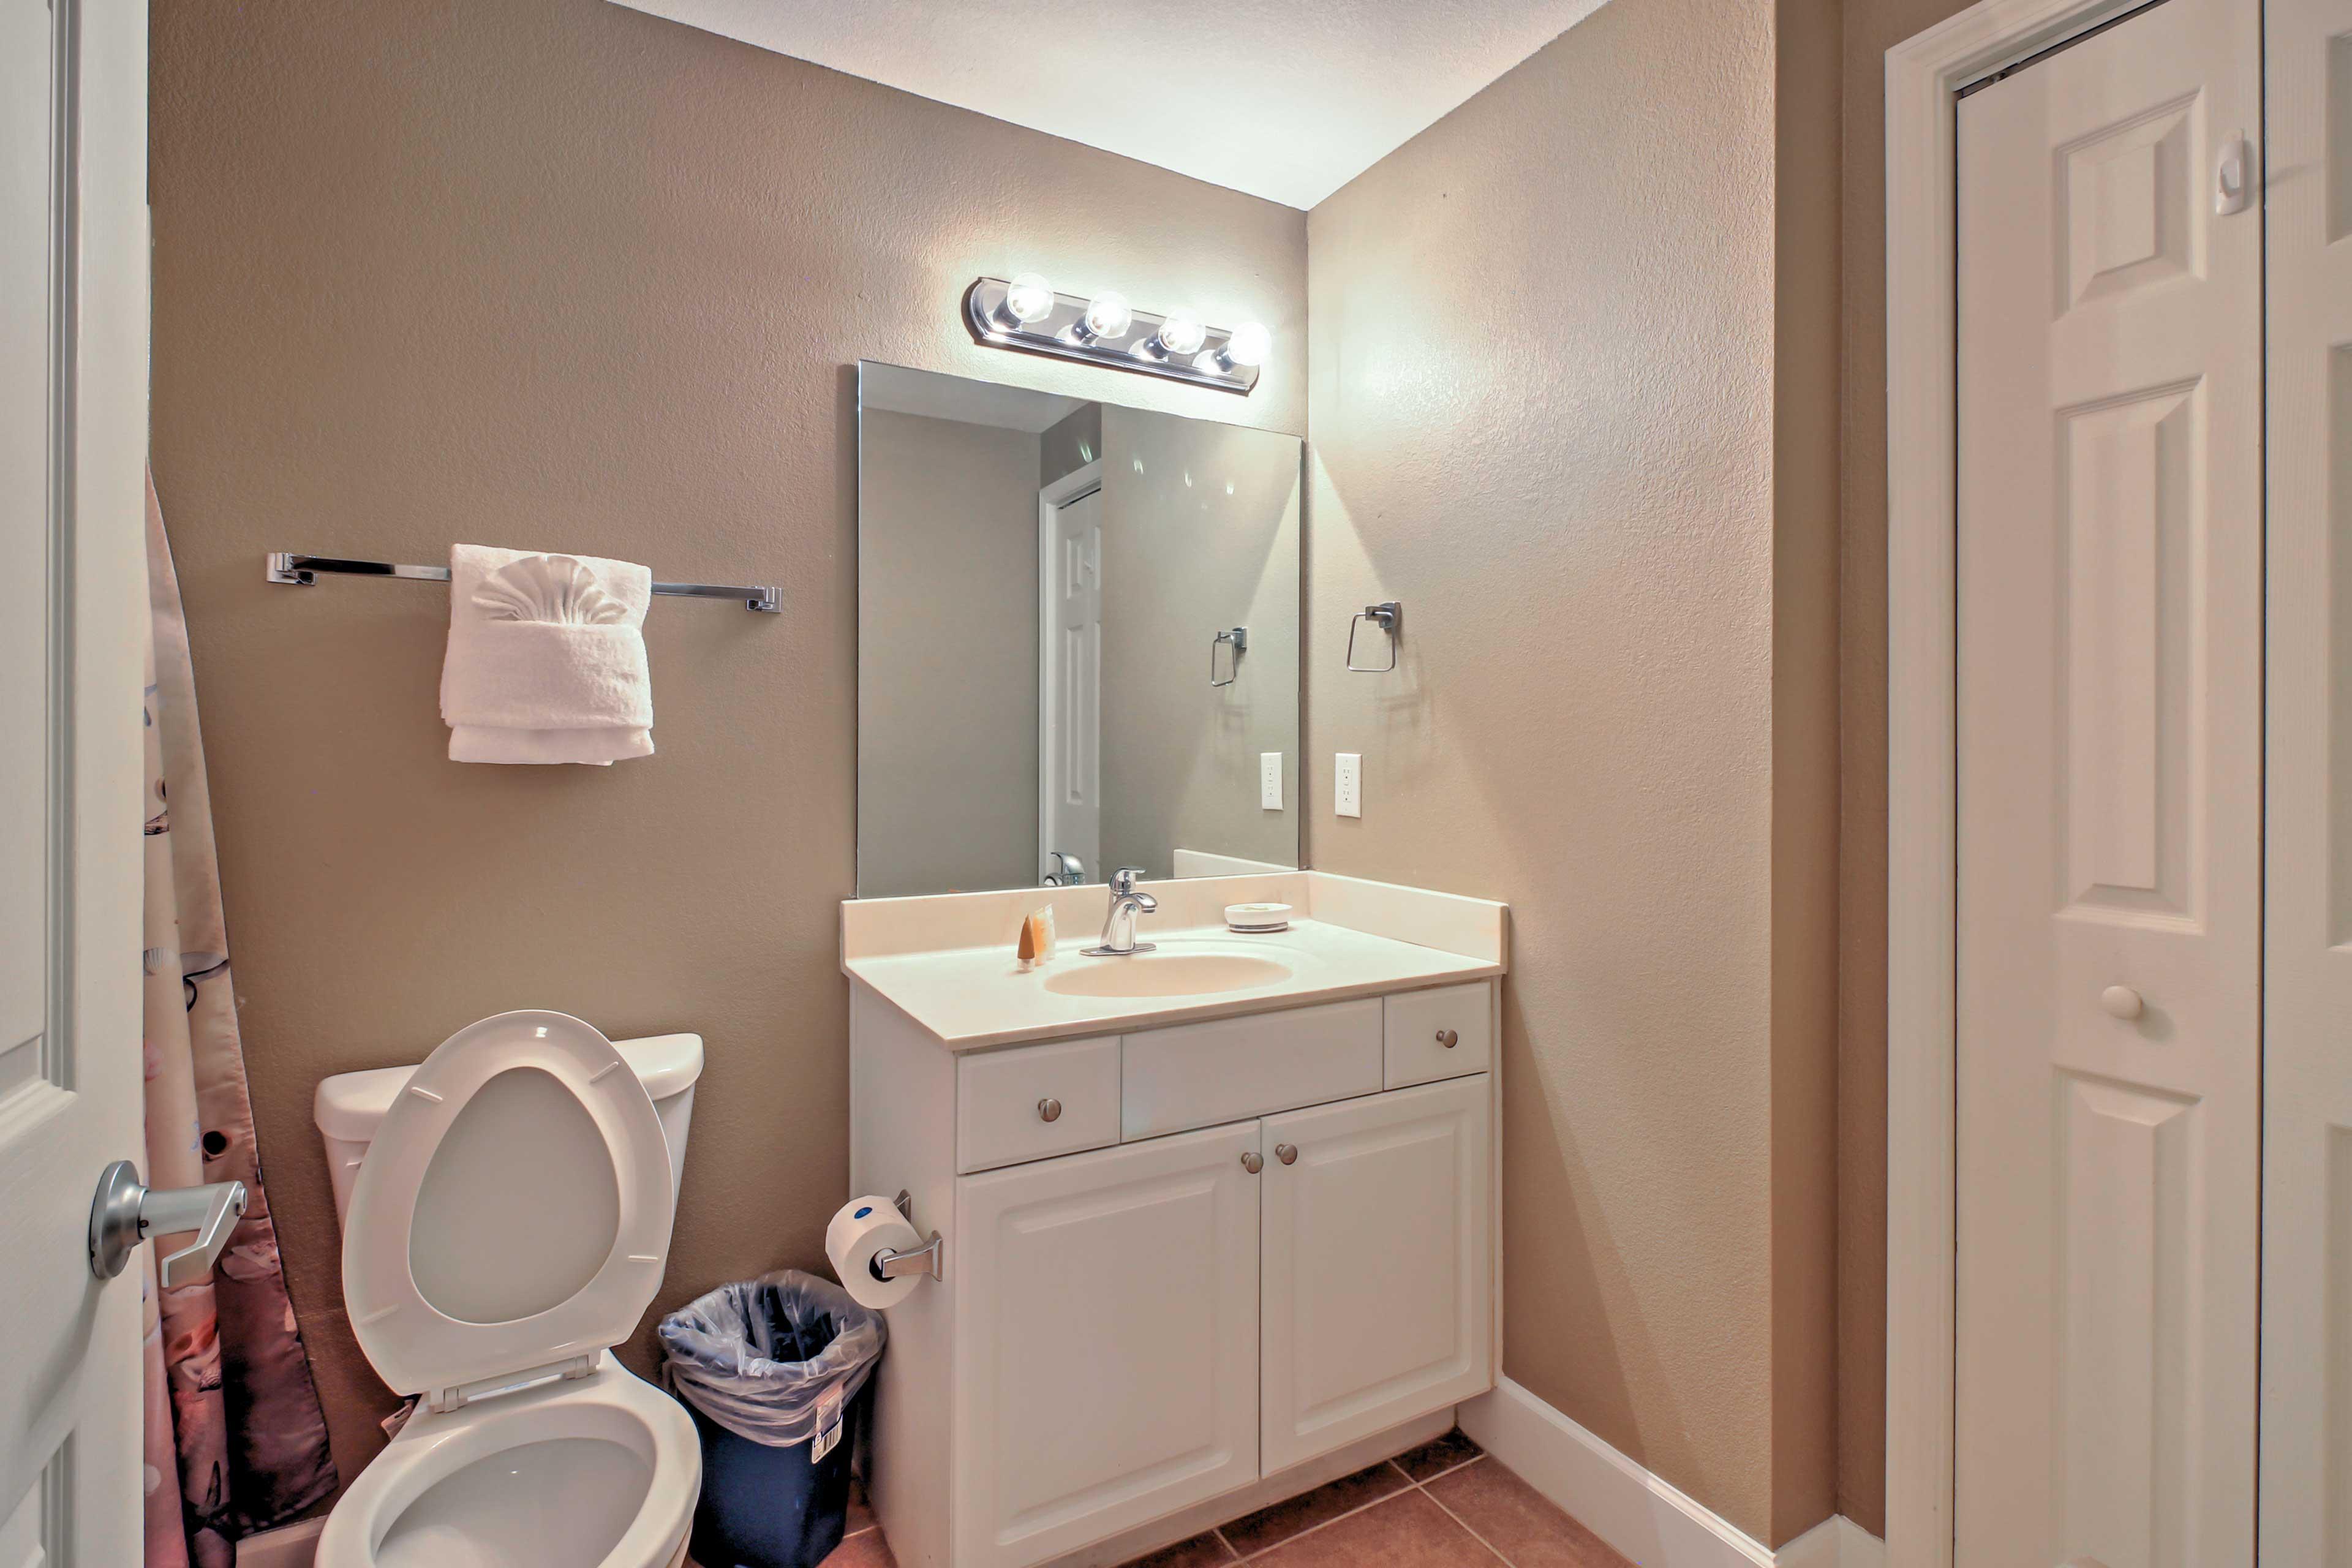 The second bedroom also has an en suite bathroom.